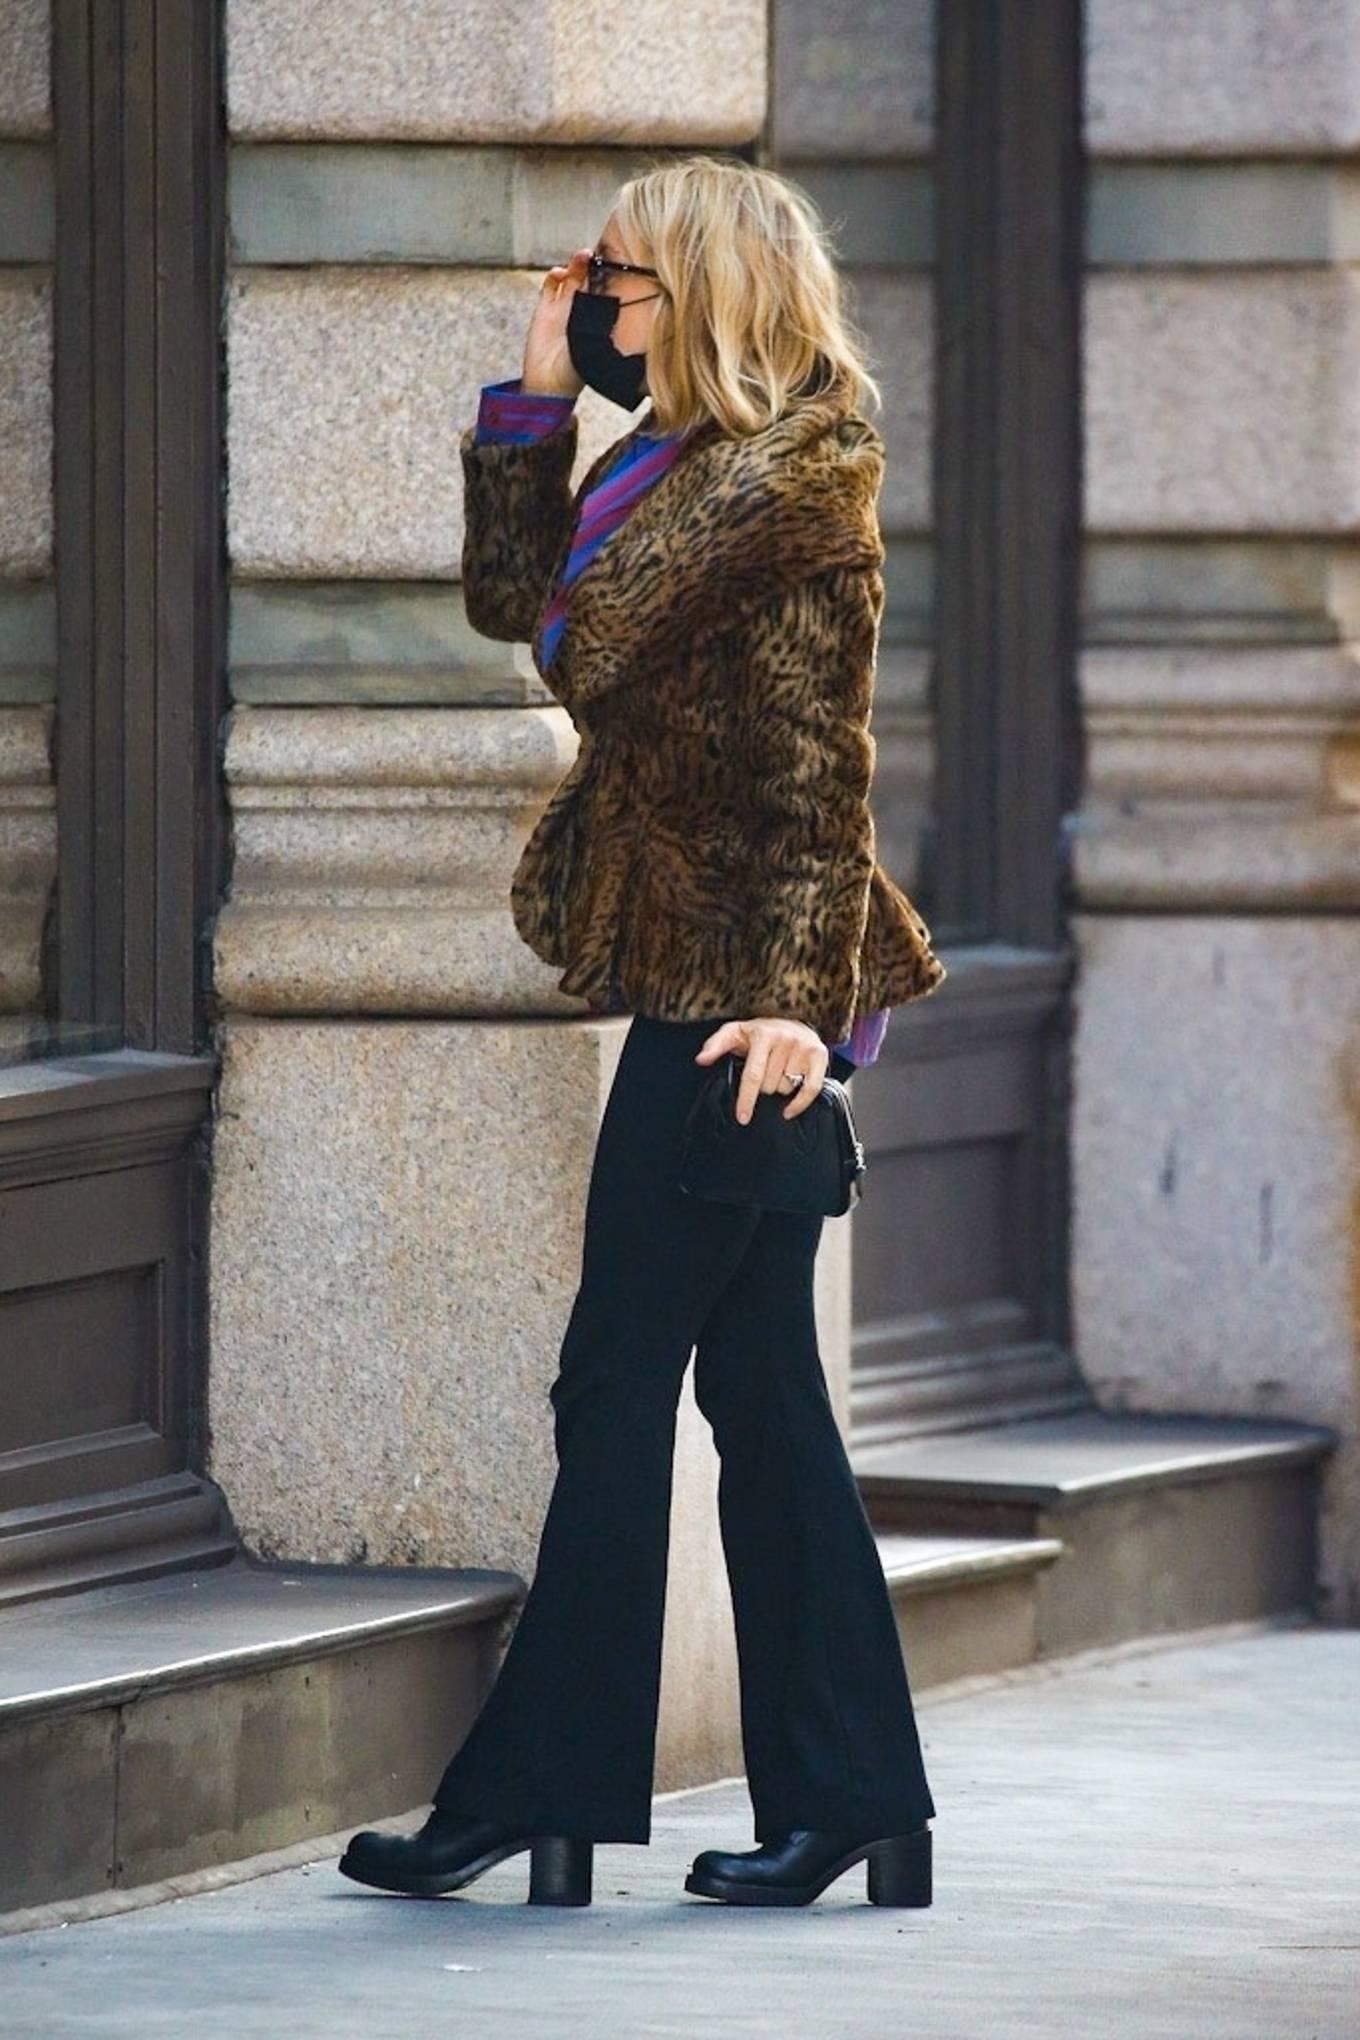 Chloe Sevigny 2021 : Chloe Sevigny – With husband Sinisa Mackovic strolling with their baby in New York-11